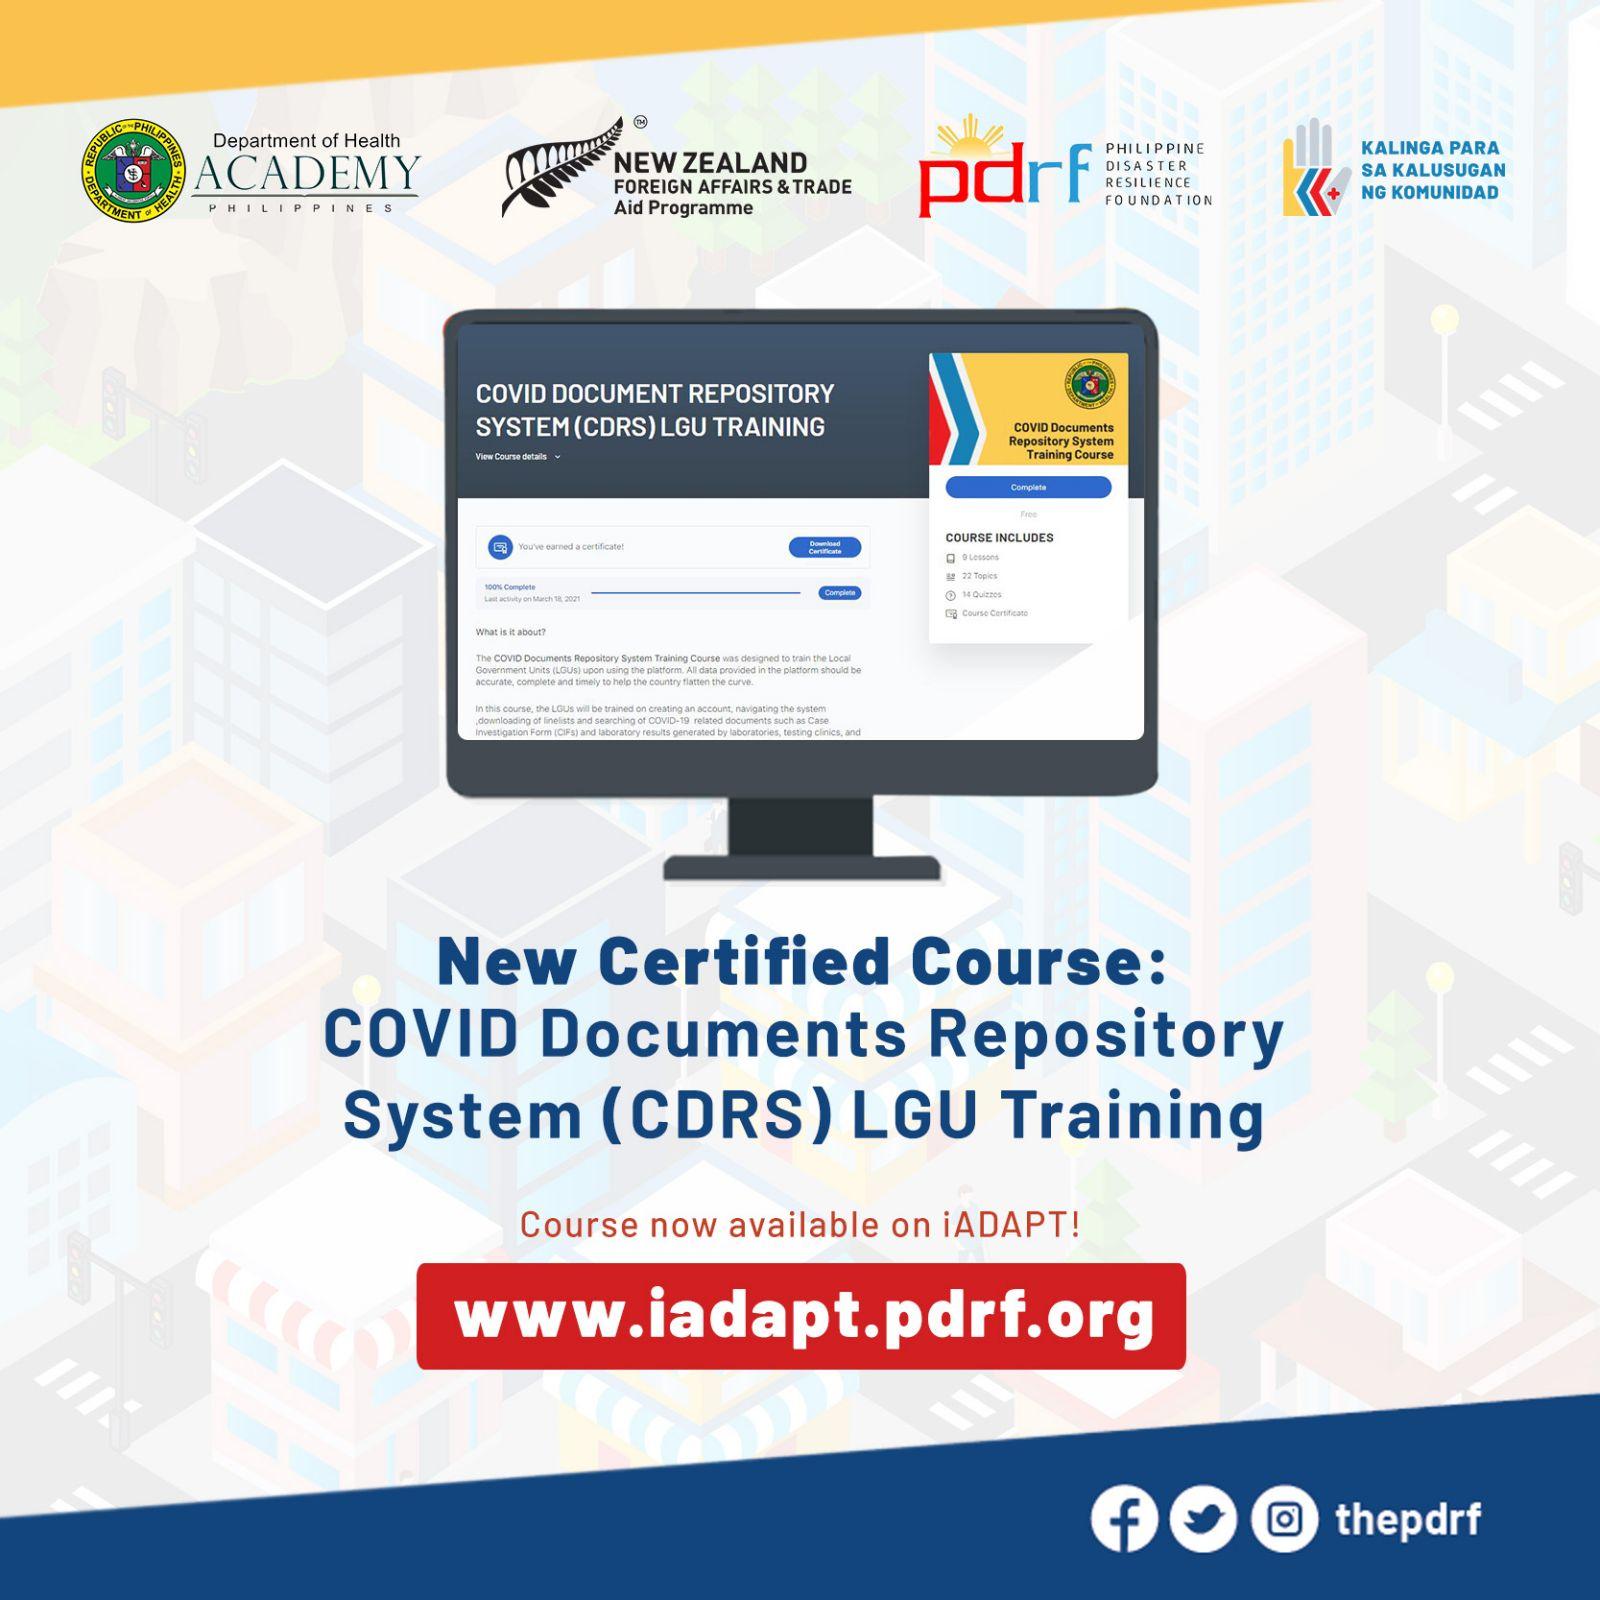 COVID-19 ICT Training Courses